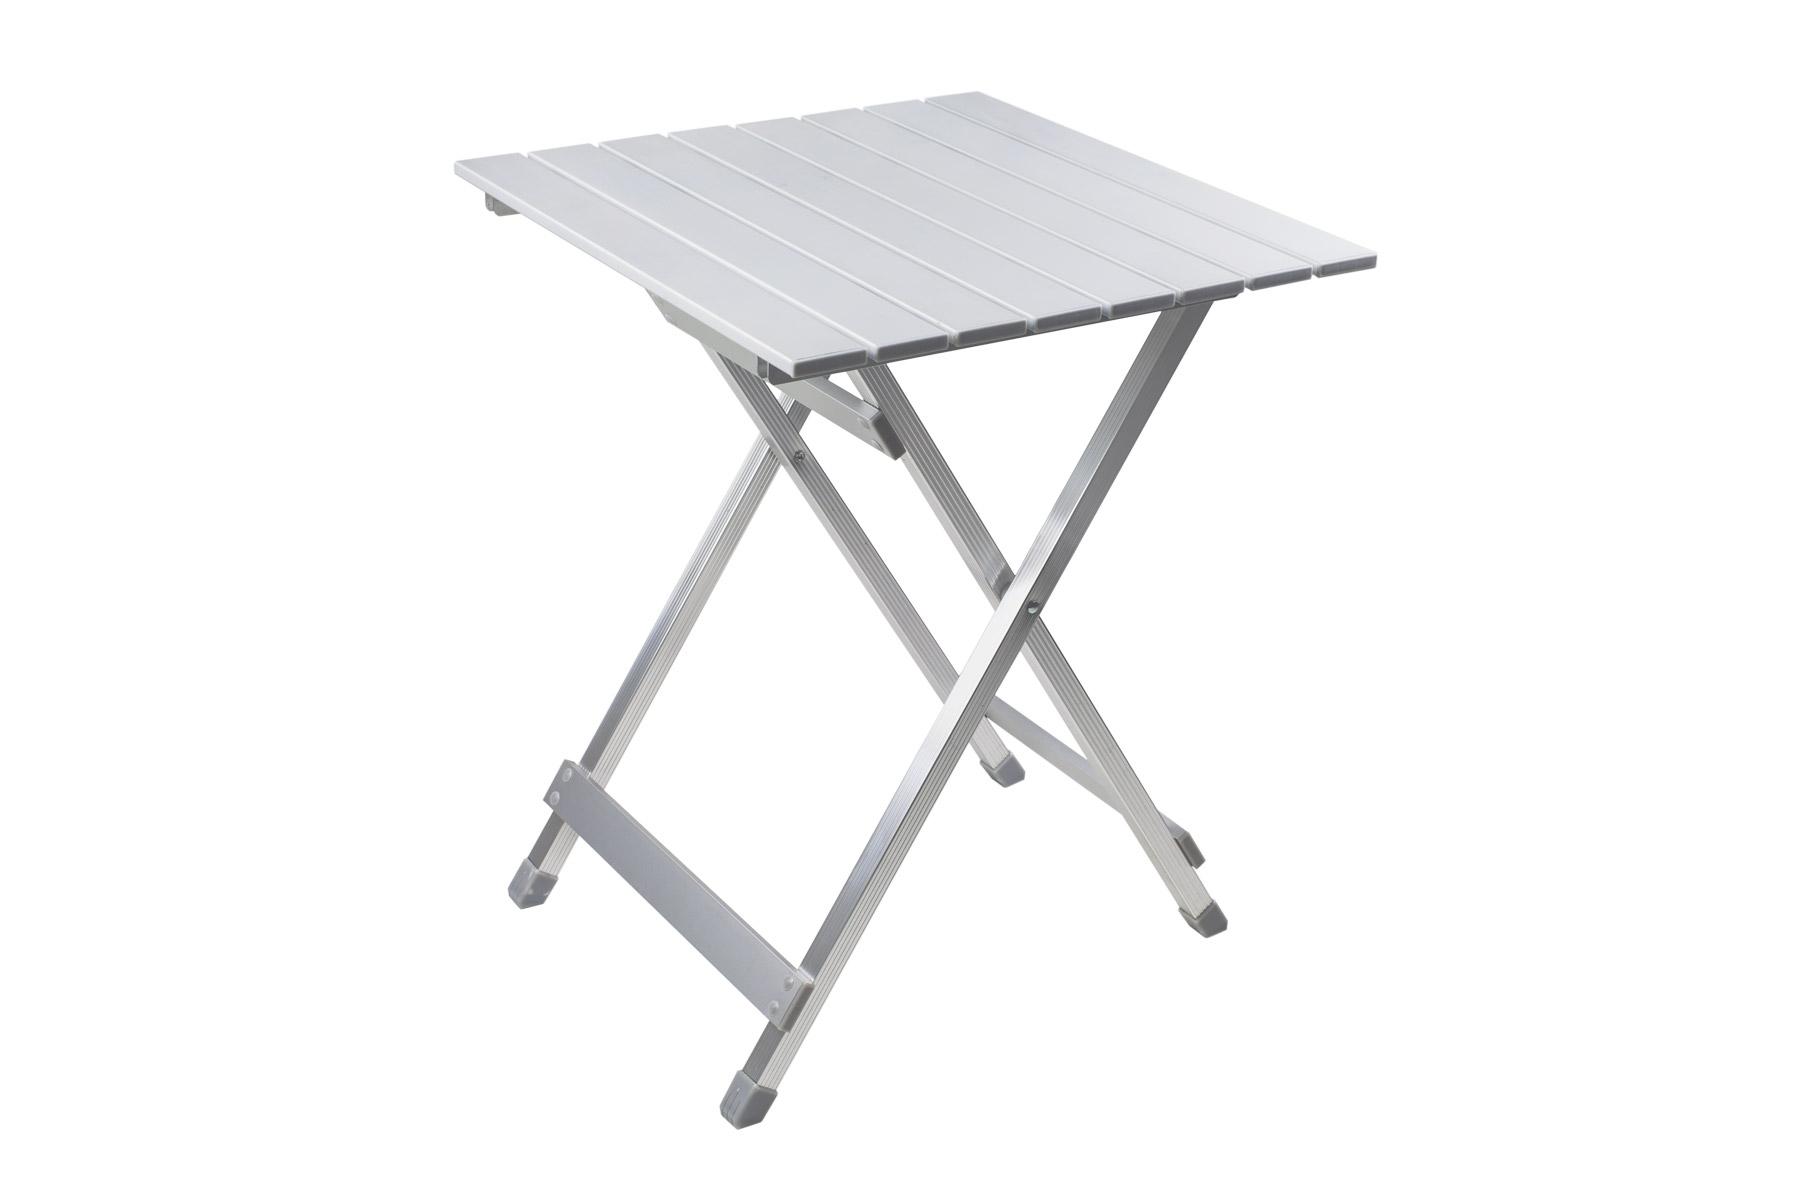 Стол складной GOGARDEN COMPACT 50 (50355) - артикул: 801910219